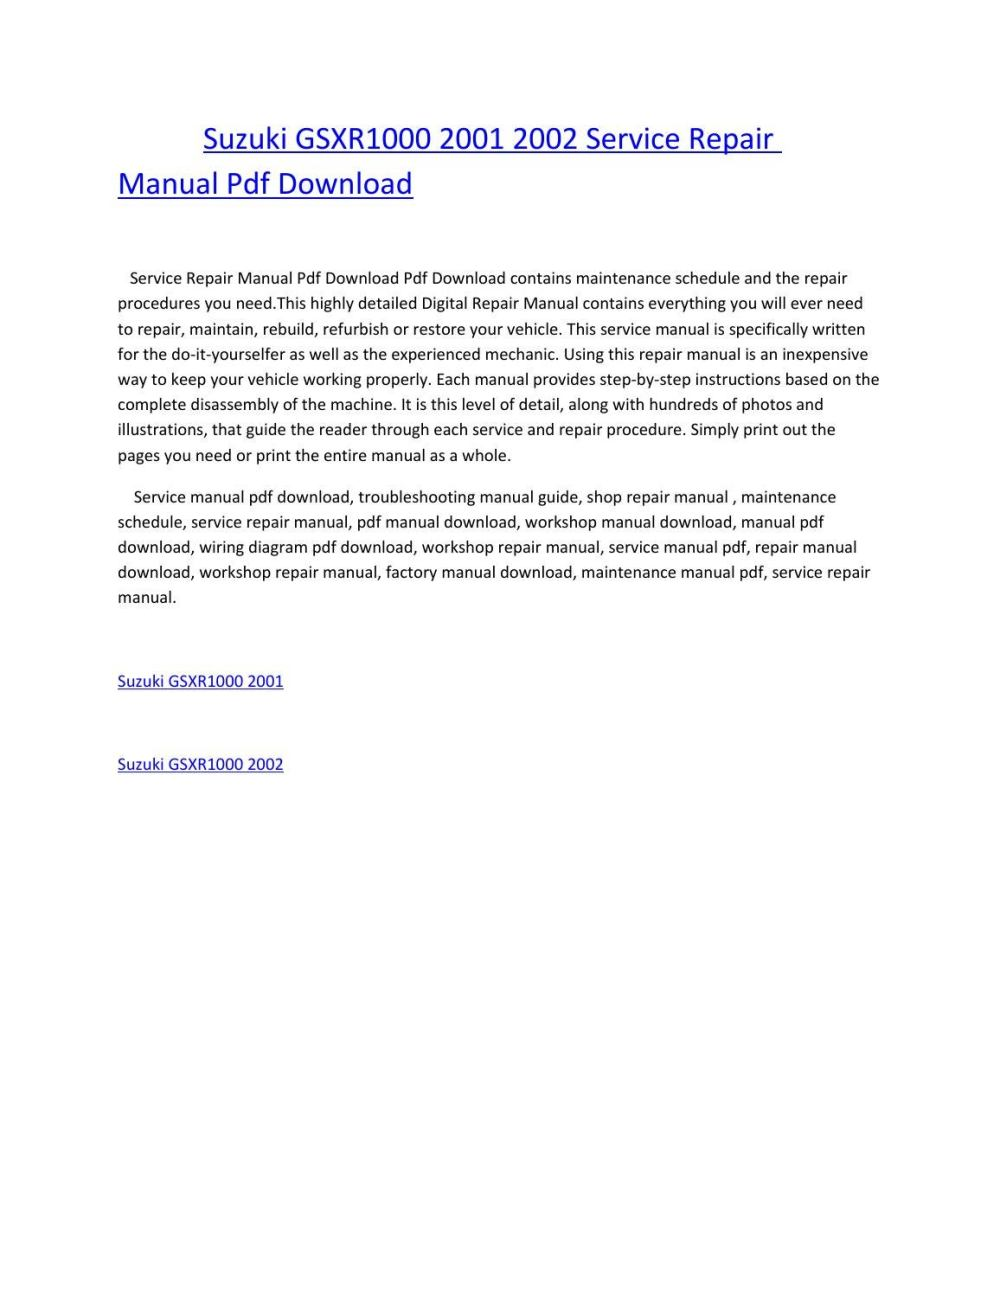 medium resolution of suzuki gsxr1000 2001 2002 service repair manual pdf download by amurgului issuu